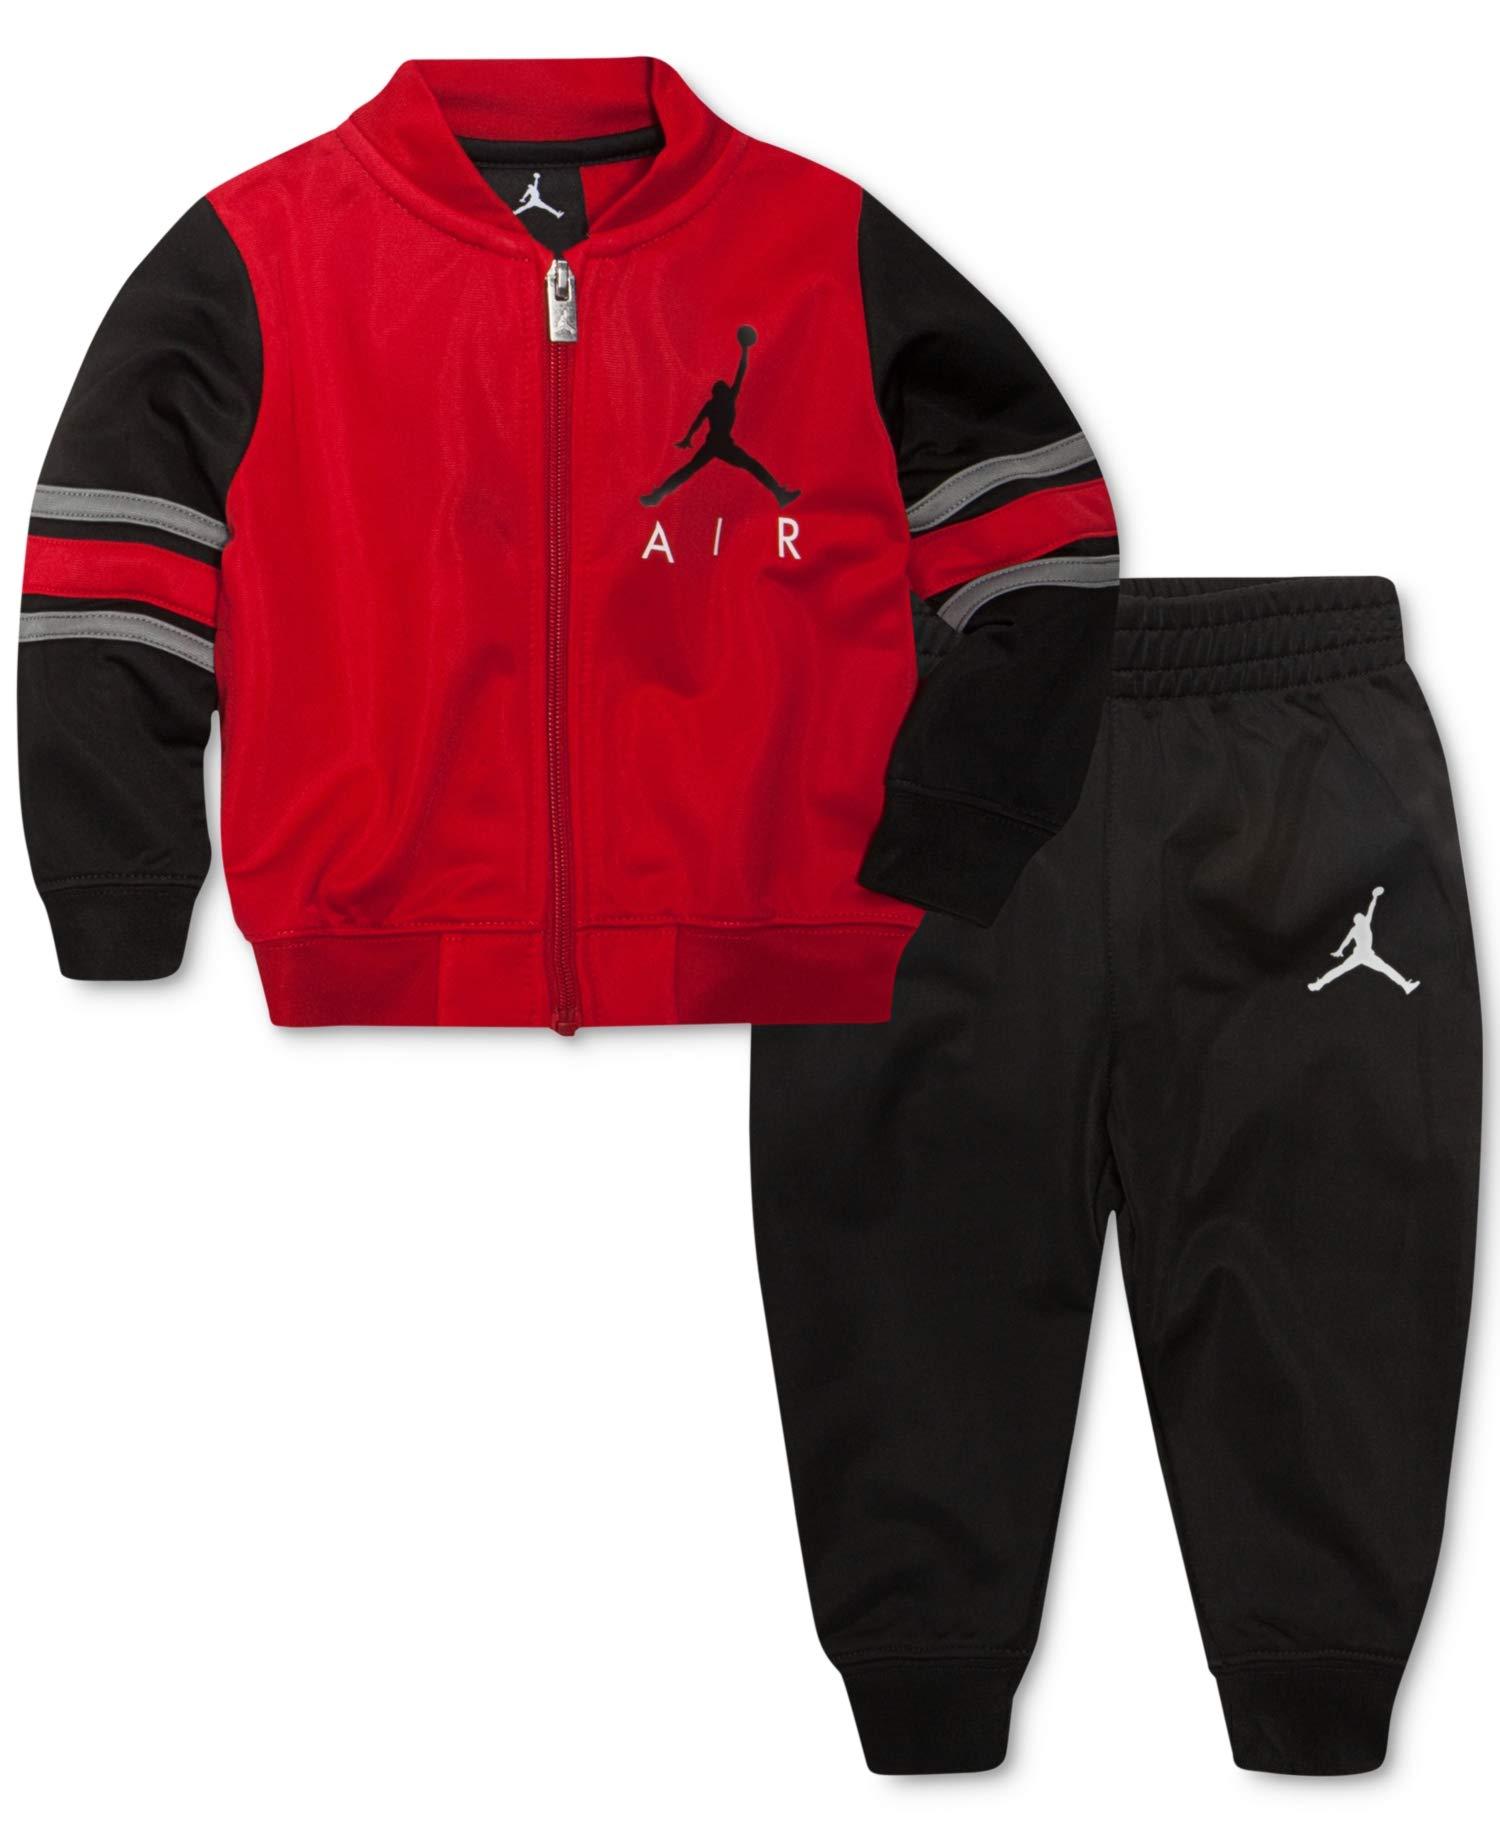 Jordan Nike Air Boys' Jacket Tracksuit Pants Outfit Track Set (Black/Gym Red, 4) by Jordan